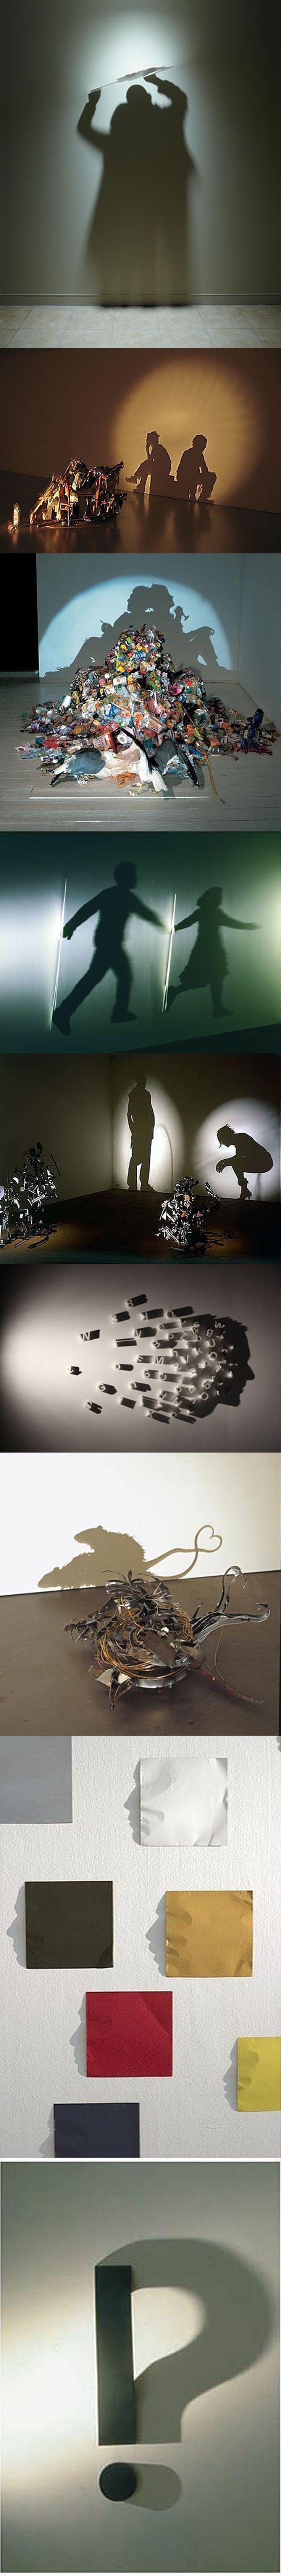 Top 10 examples of brilliant shadow art